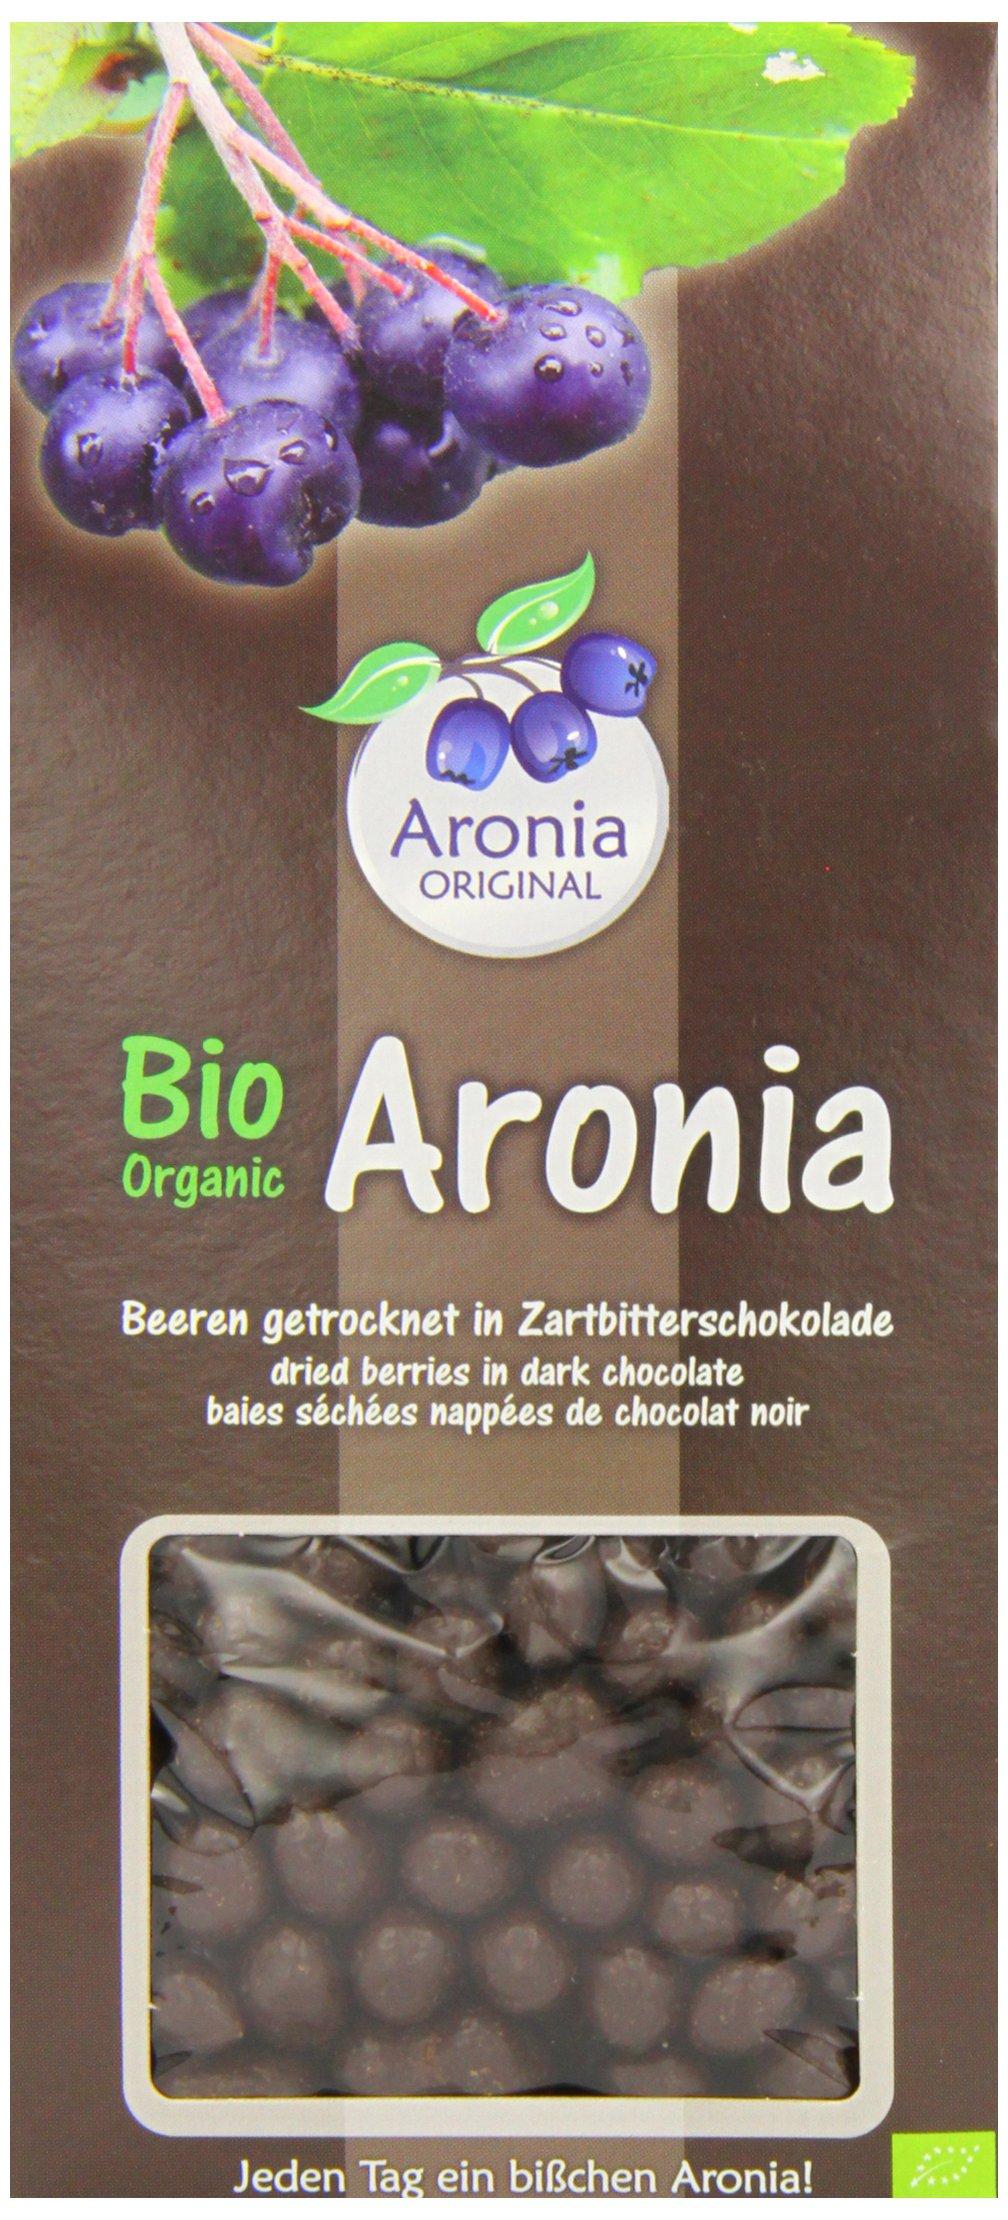 Aronia Original Bio Cioccolato aroniabeeren (schokoliert), 1er Pack (1x 200g)